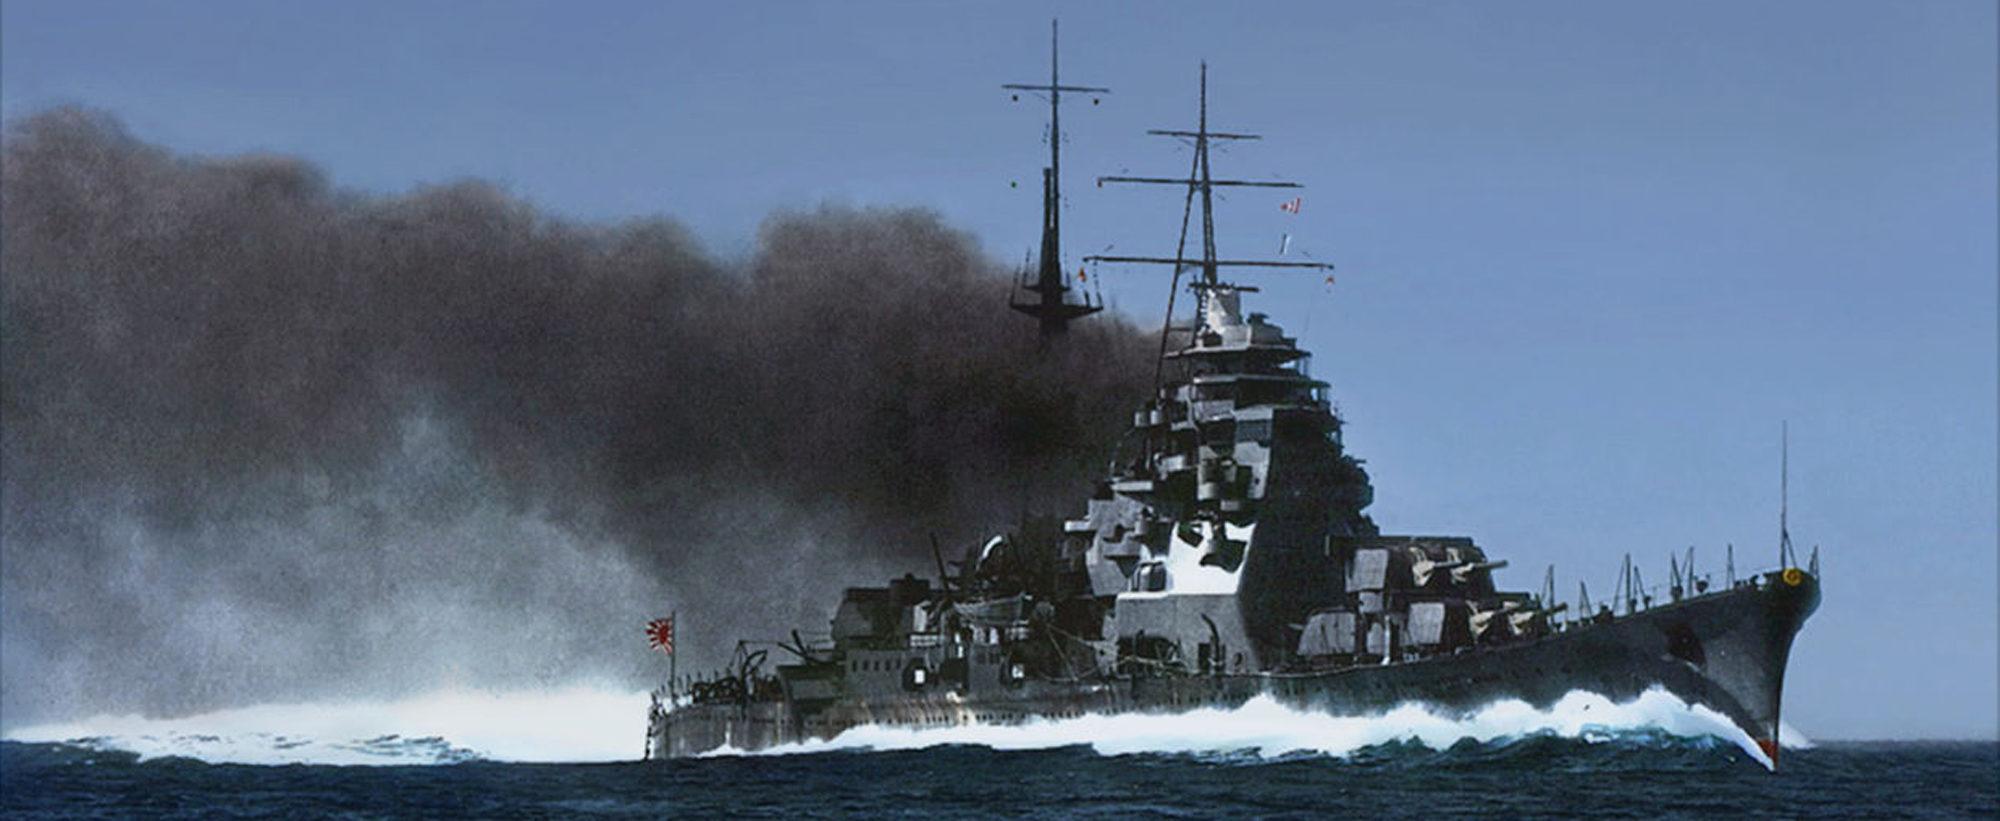 takao class cruisers (1930) - naval encyclopedia